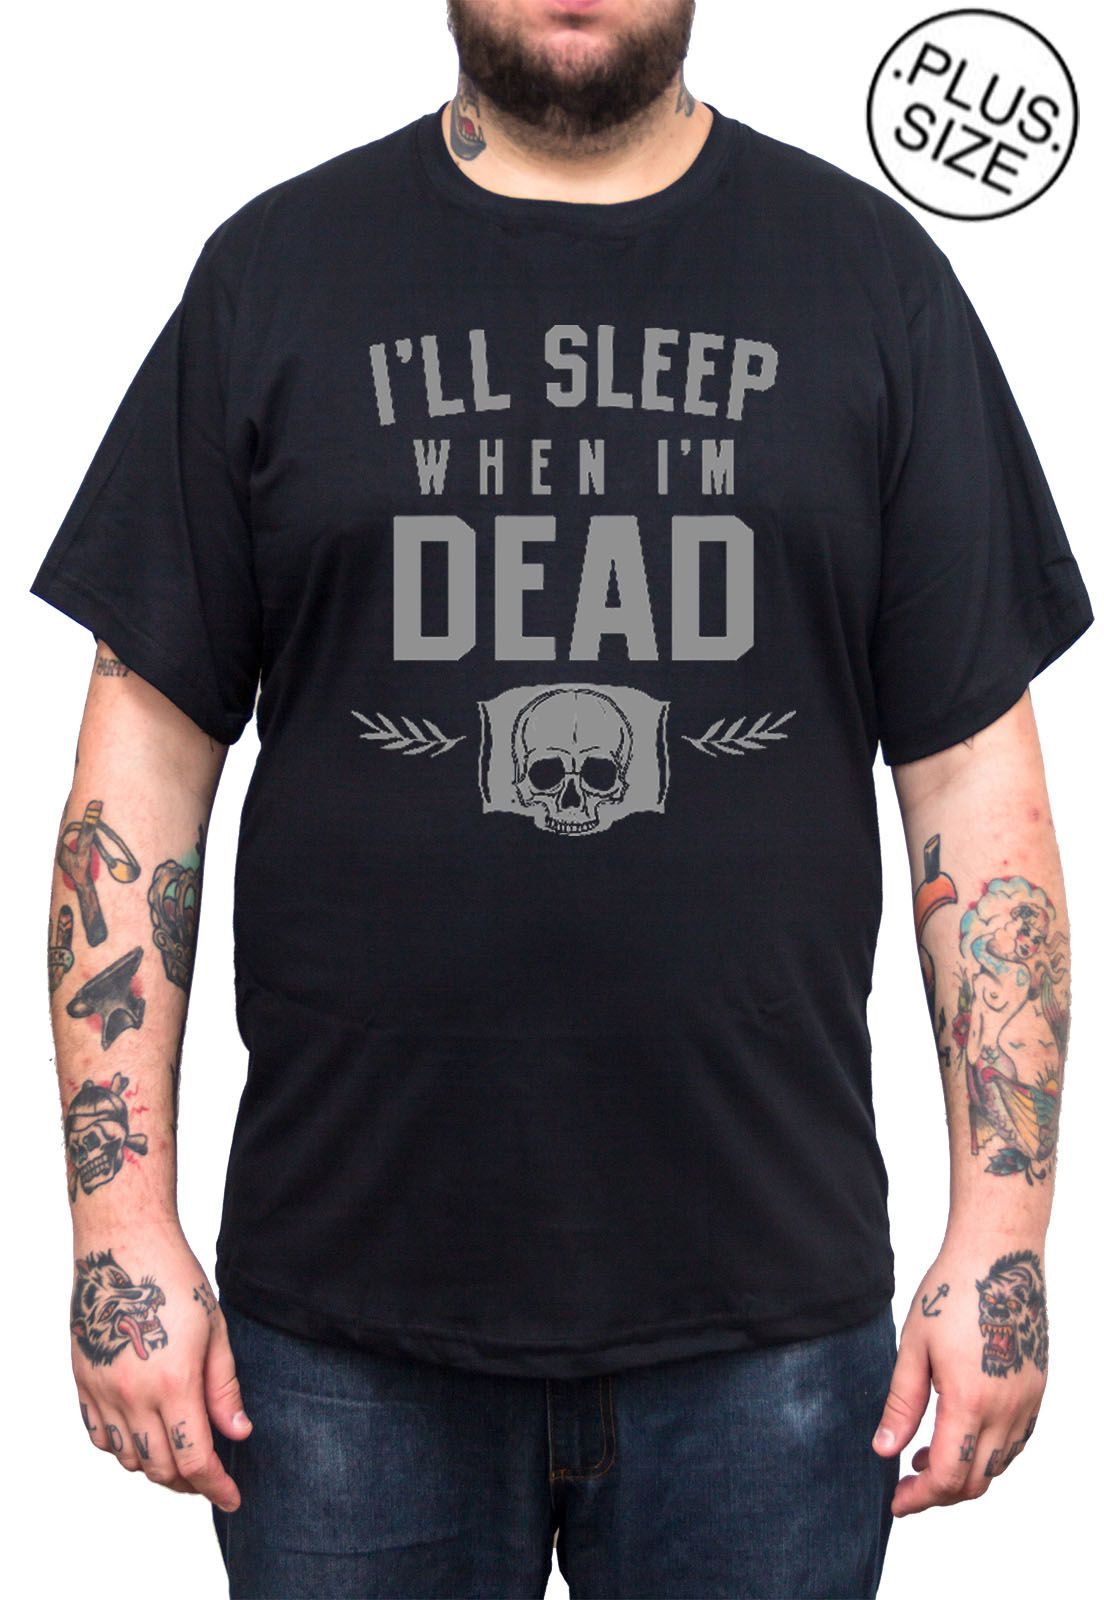 Camiseta Hshop Sleep When Dead - Preto - Plus Size - Tamanho Grande XG  - HShop